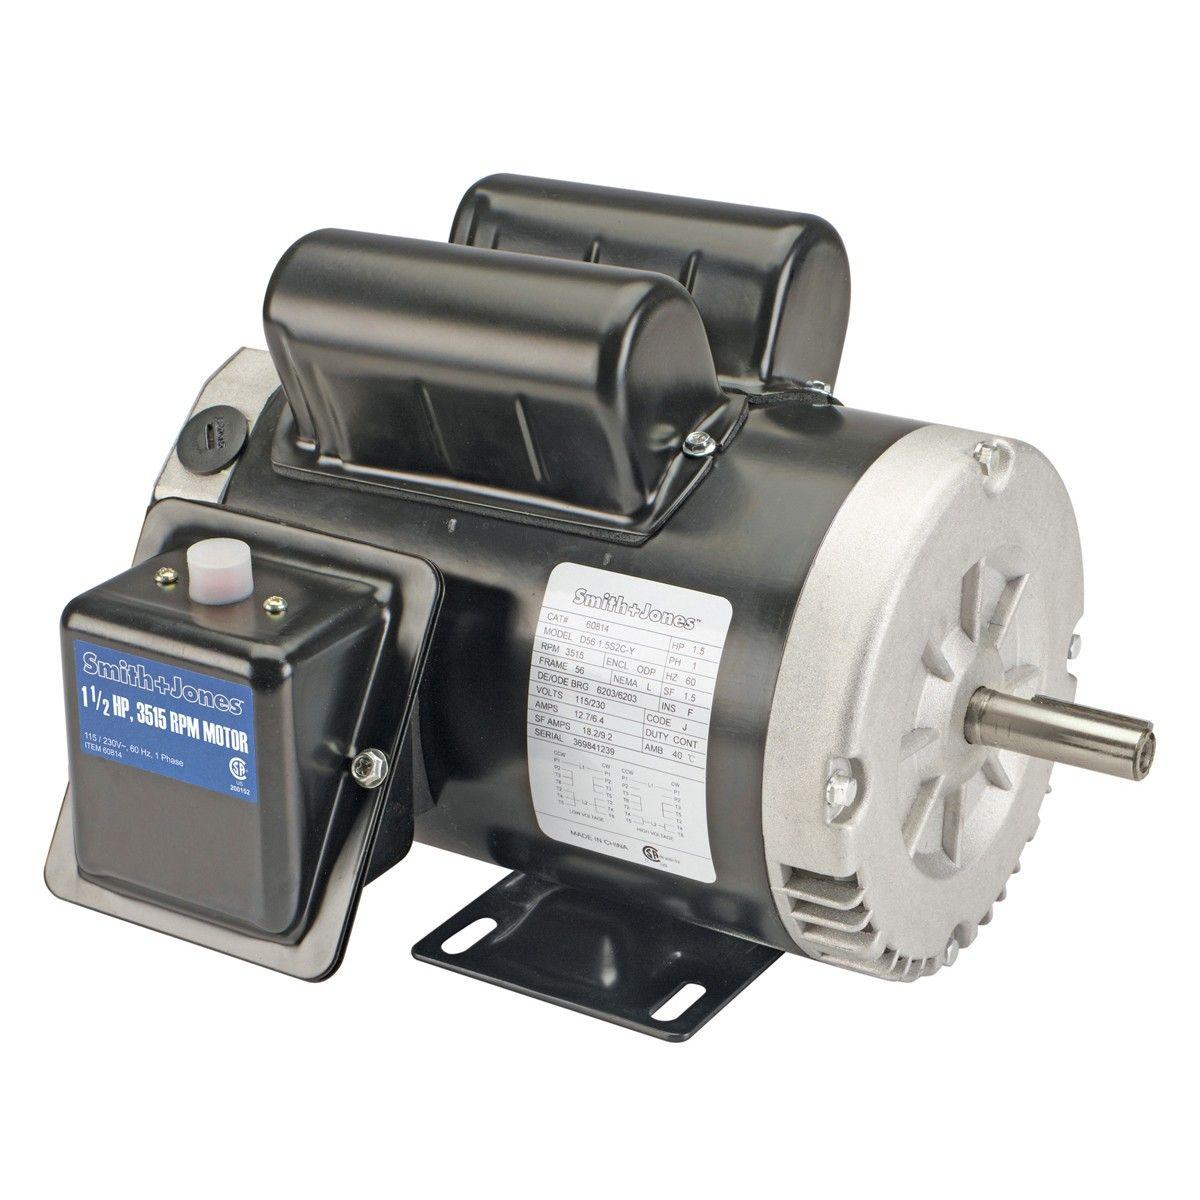 Smith Jones 60814 11 2 Horsepower Compressor Duty Motor